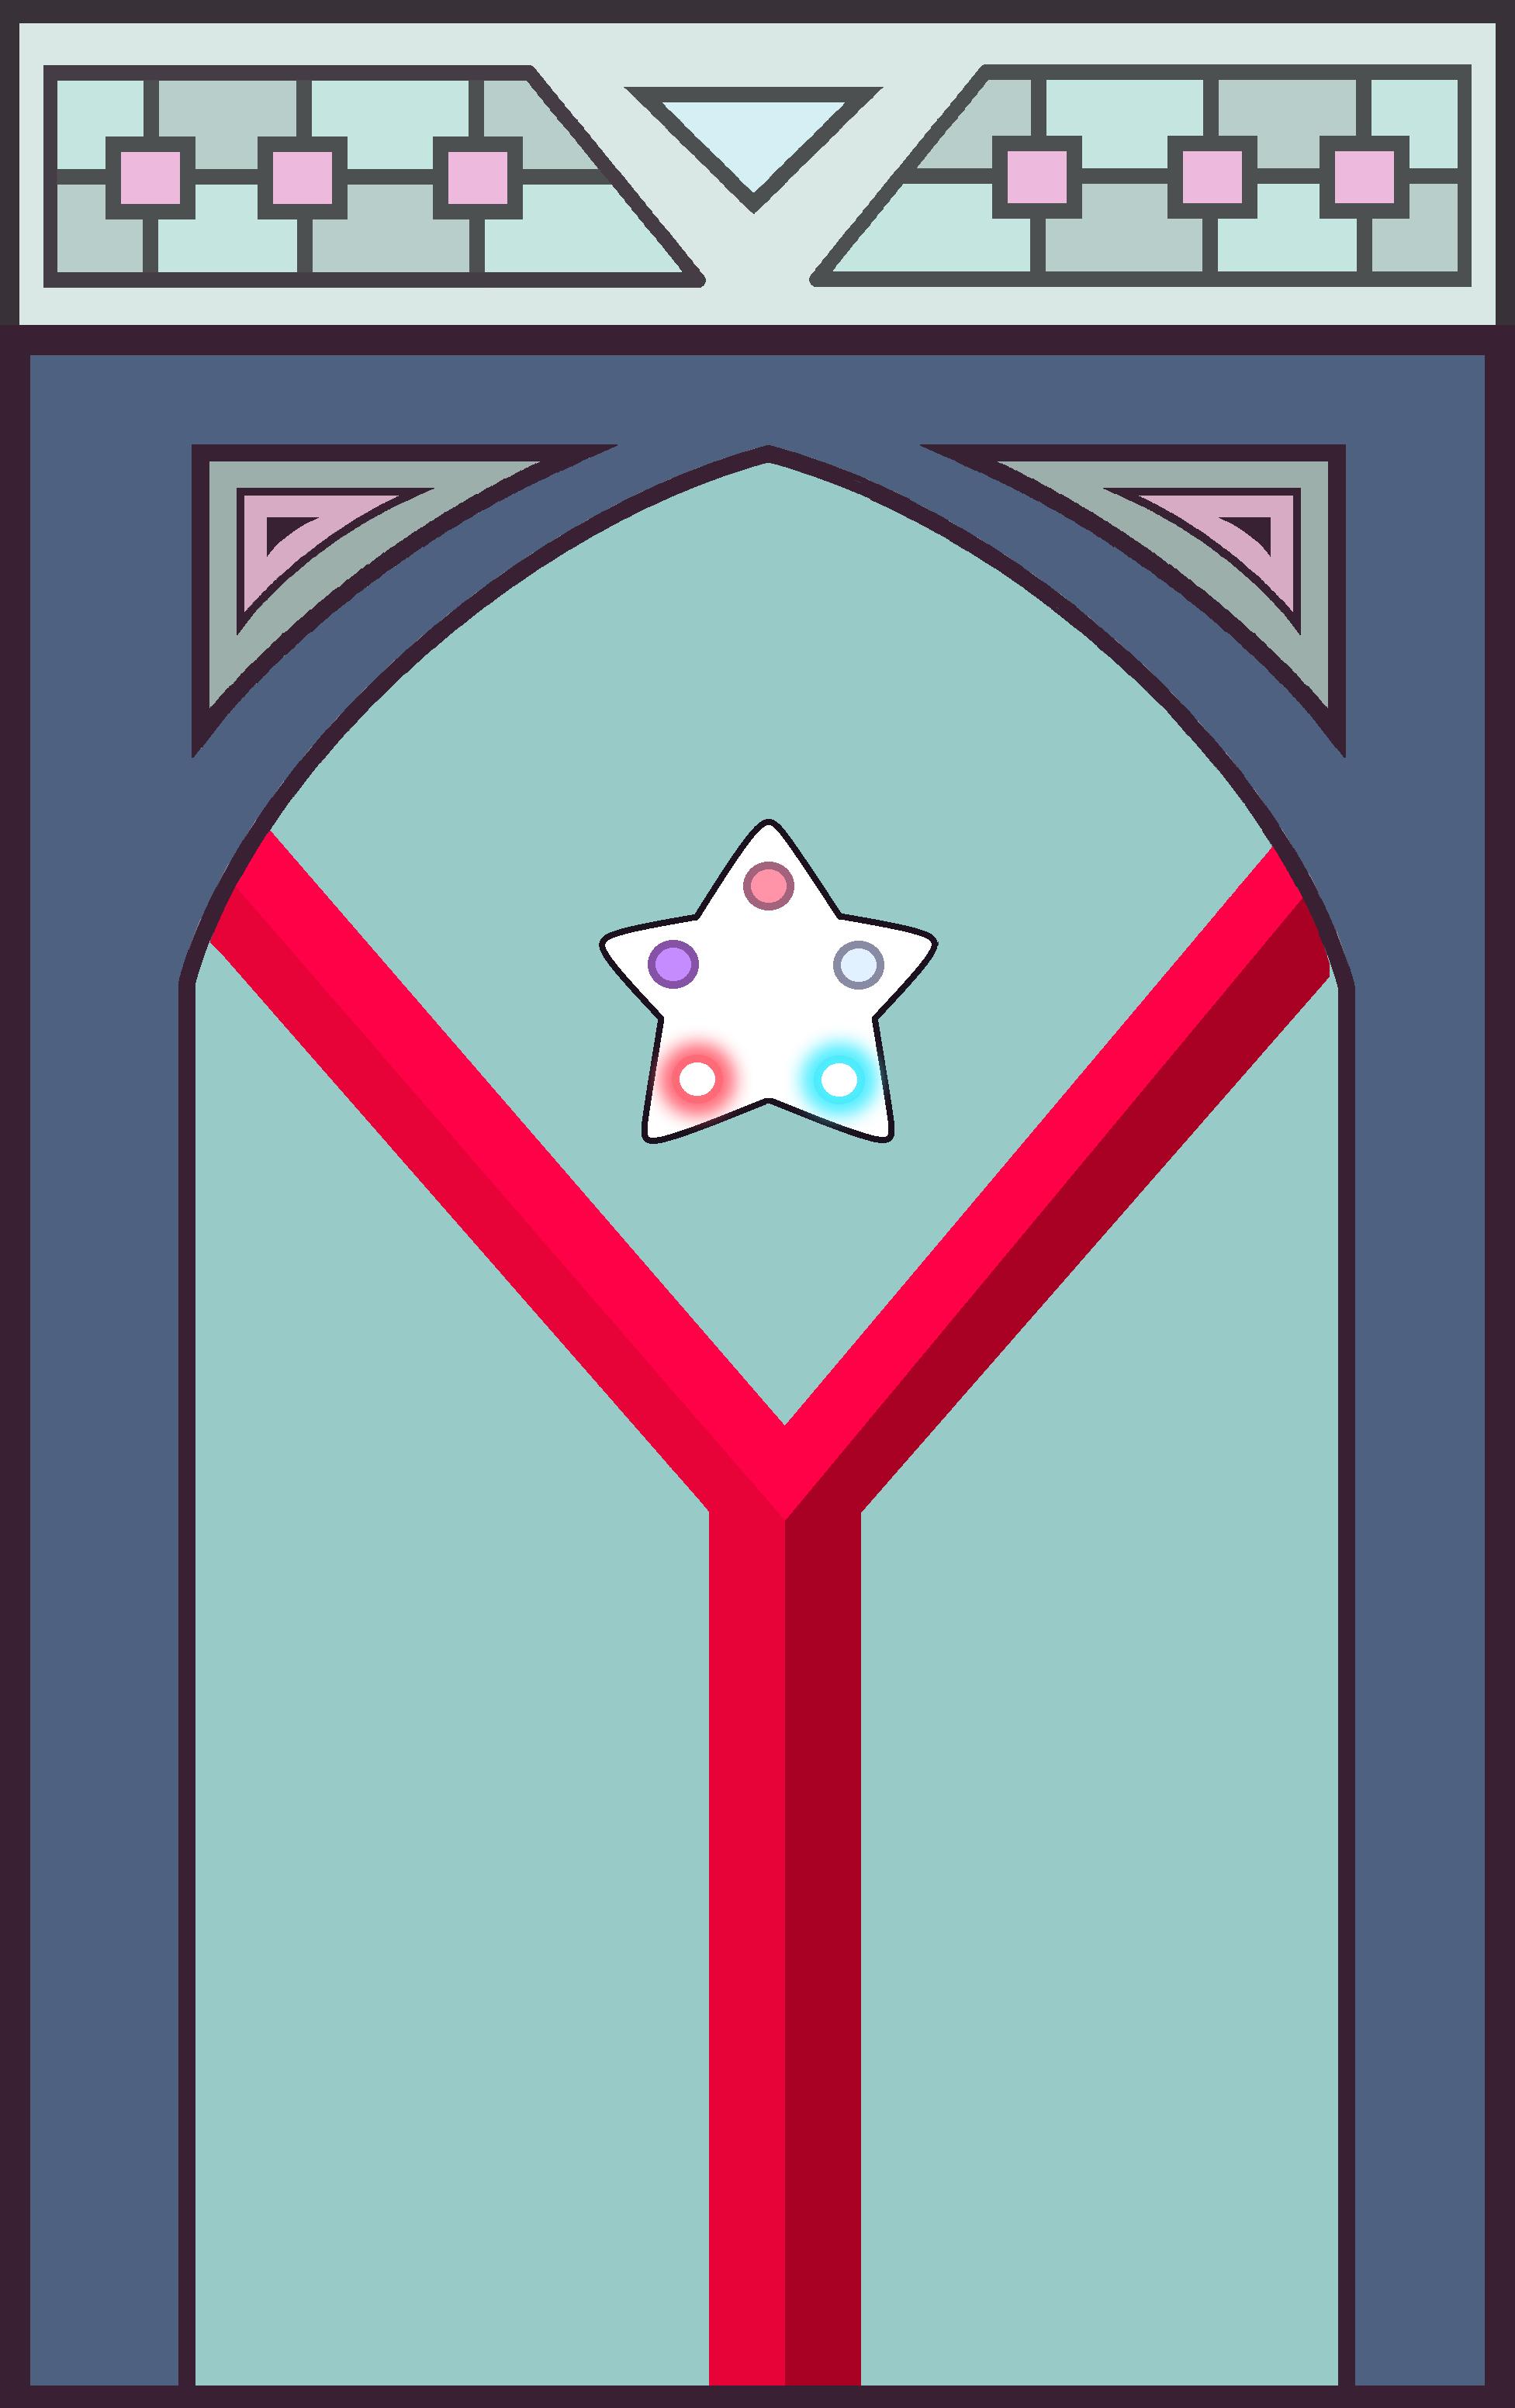 Imagen Puerta Del Templo Garnet Png Steven Universe